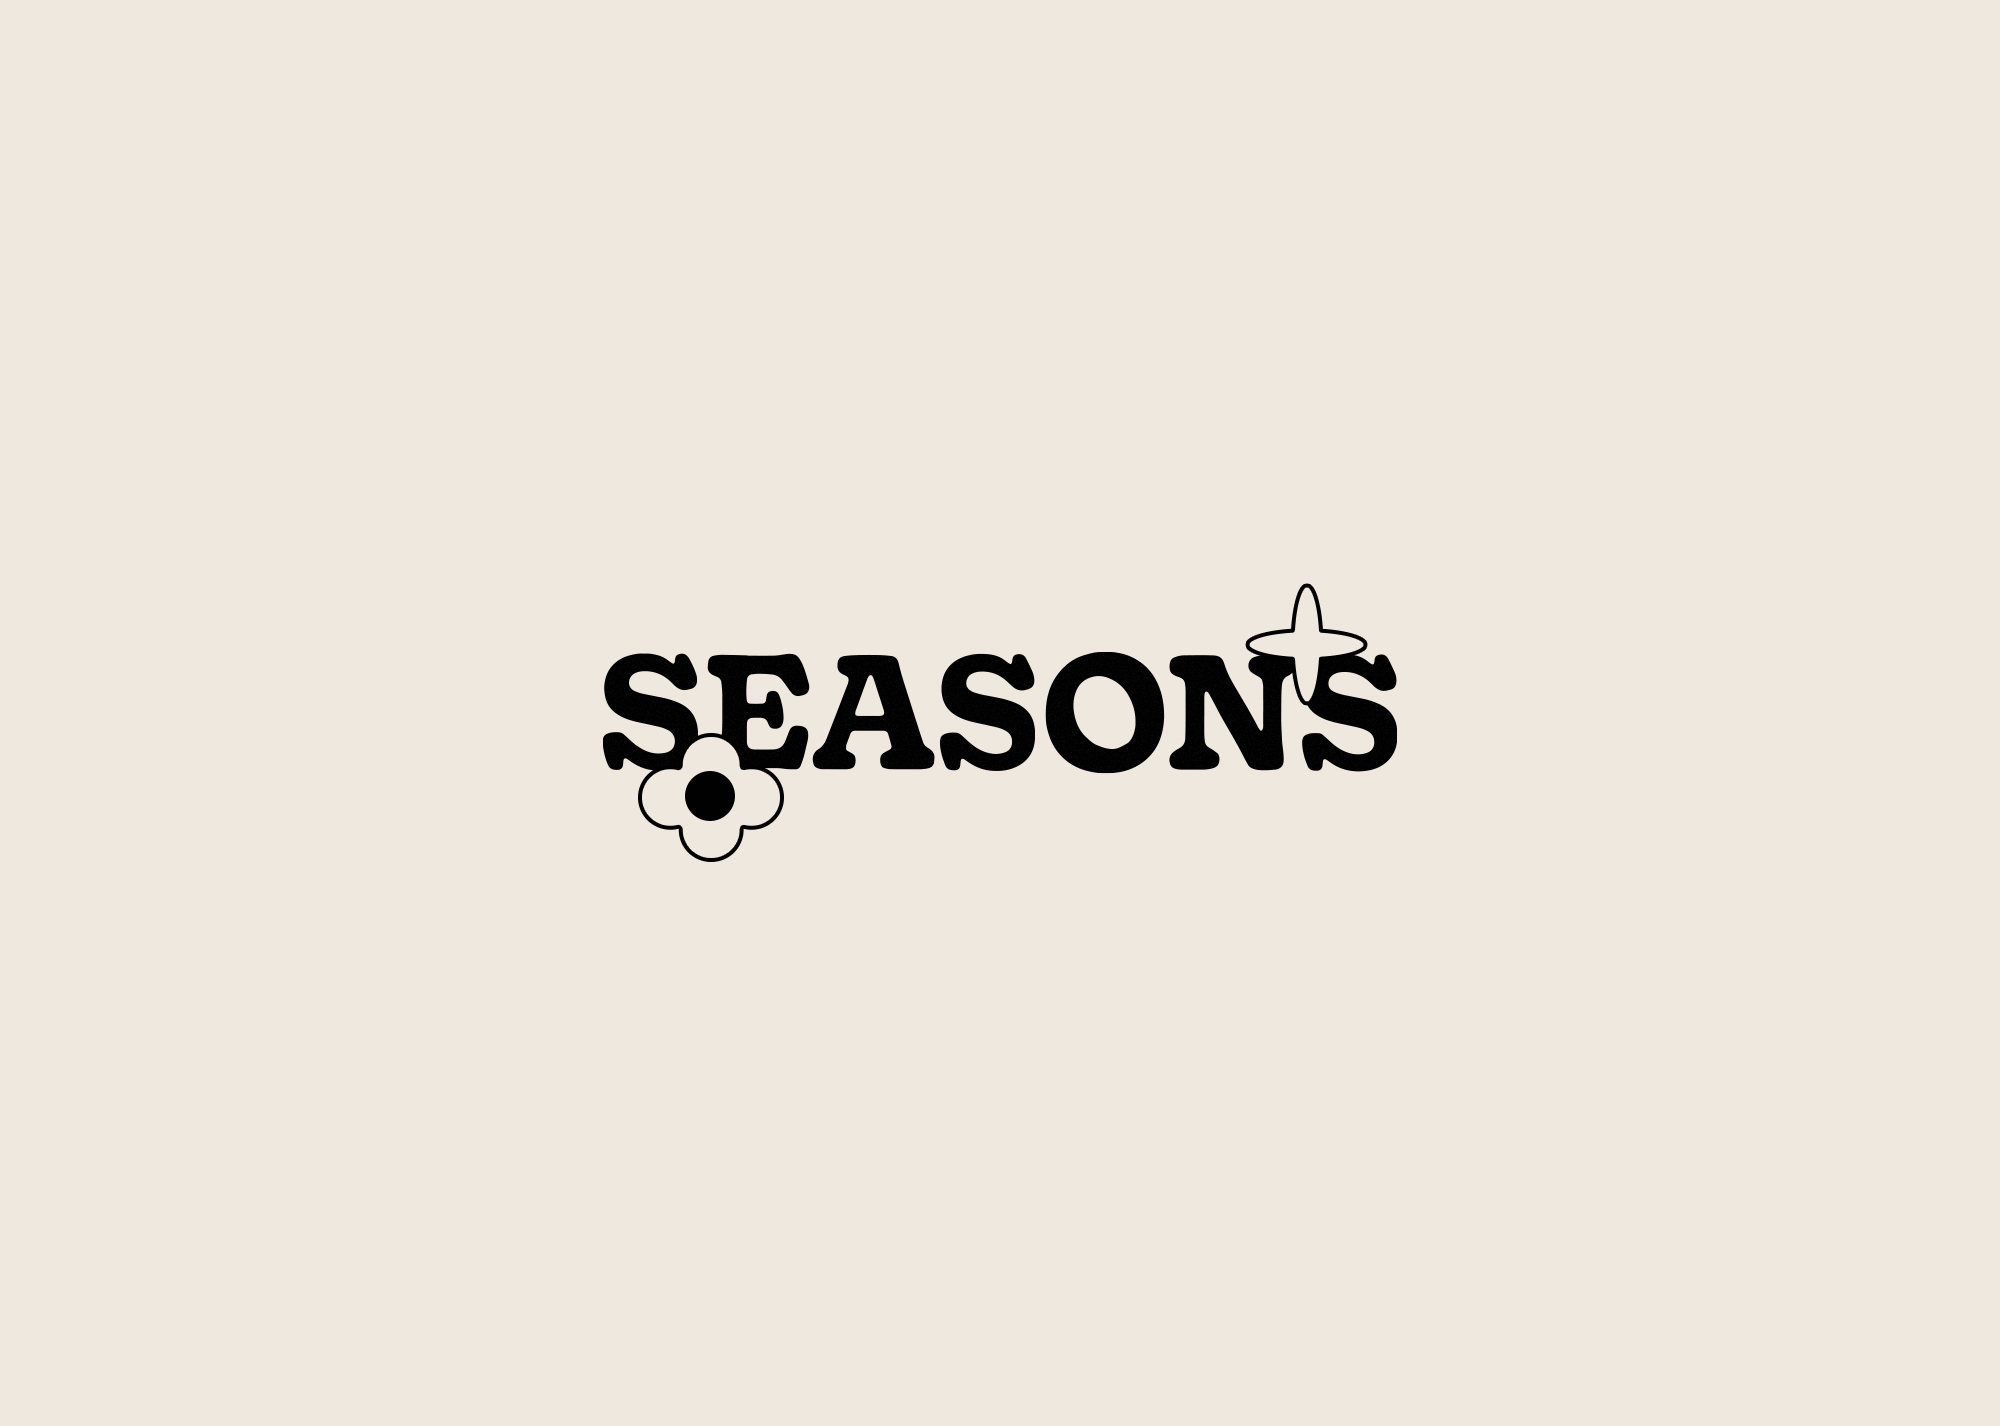 Seasons2.2